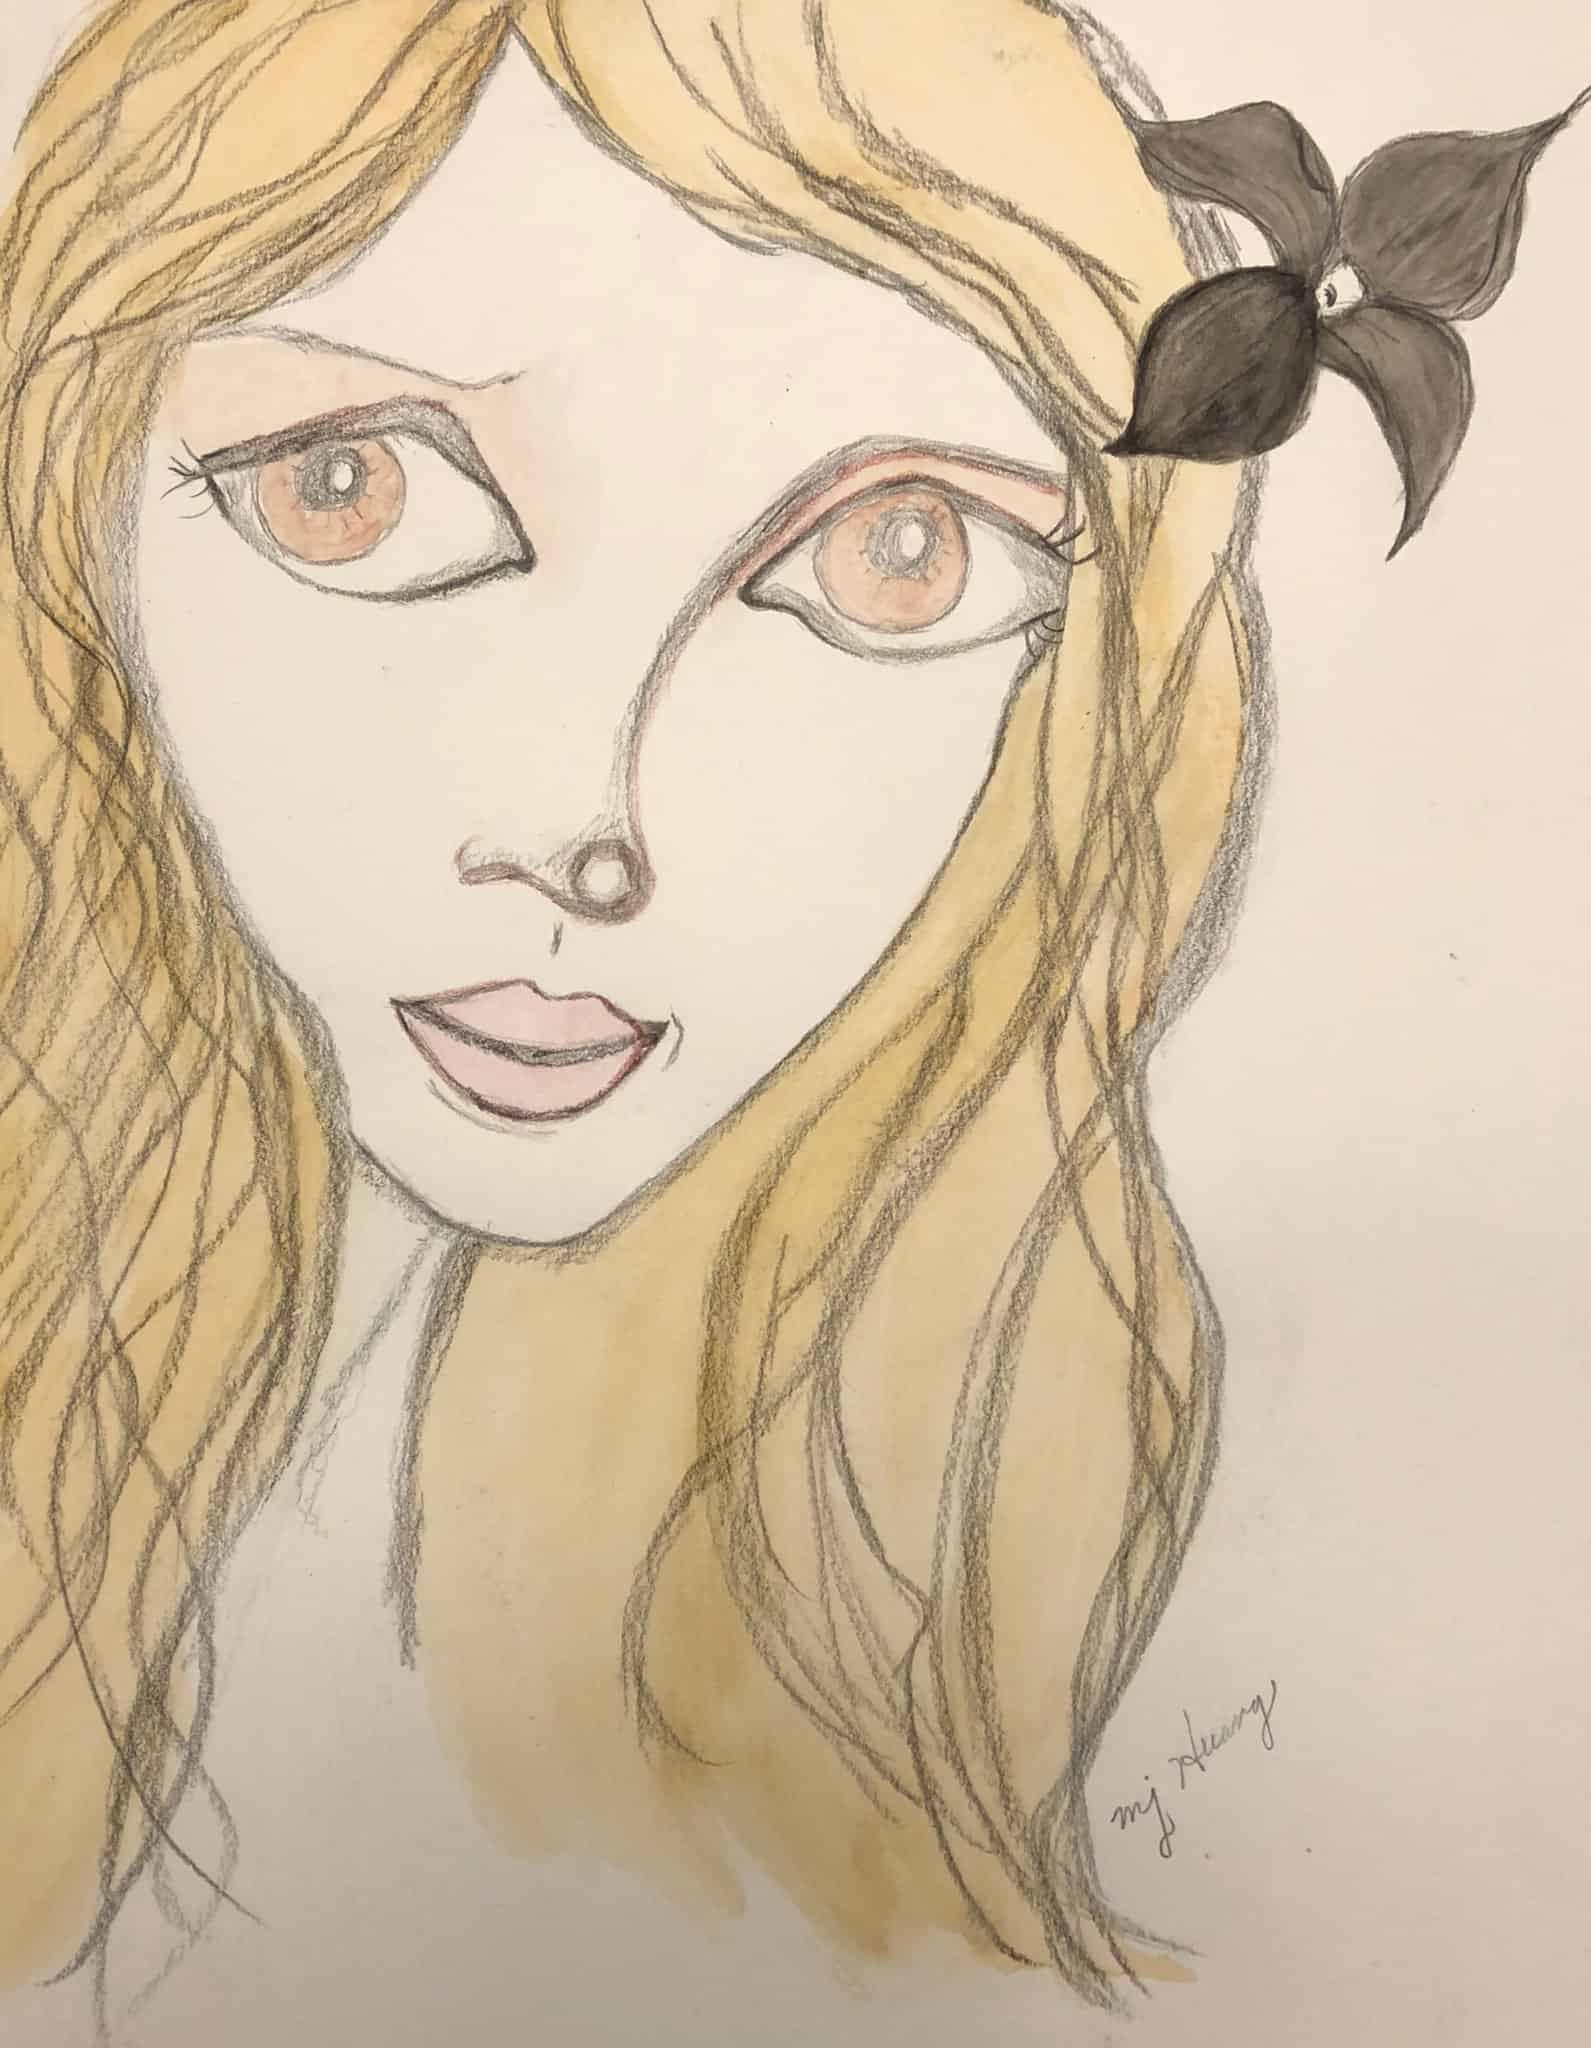 Dolor, Artful Adoptee - Dibujo